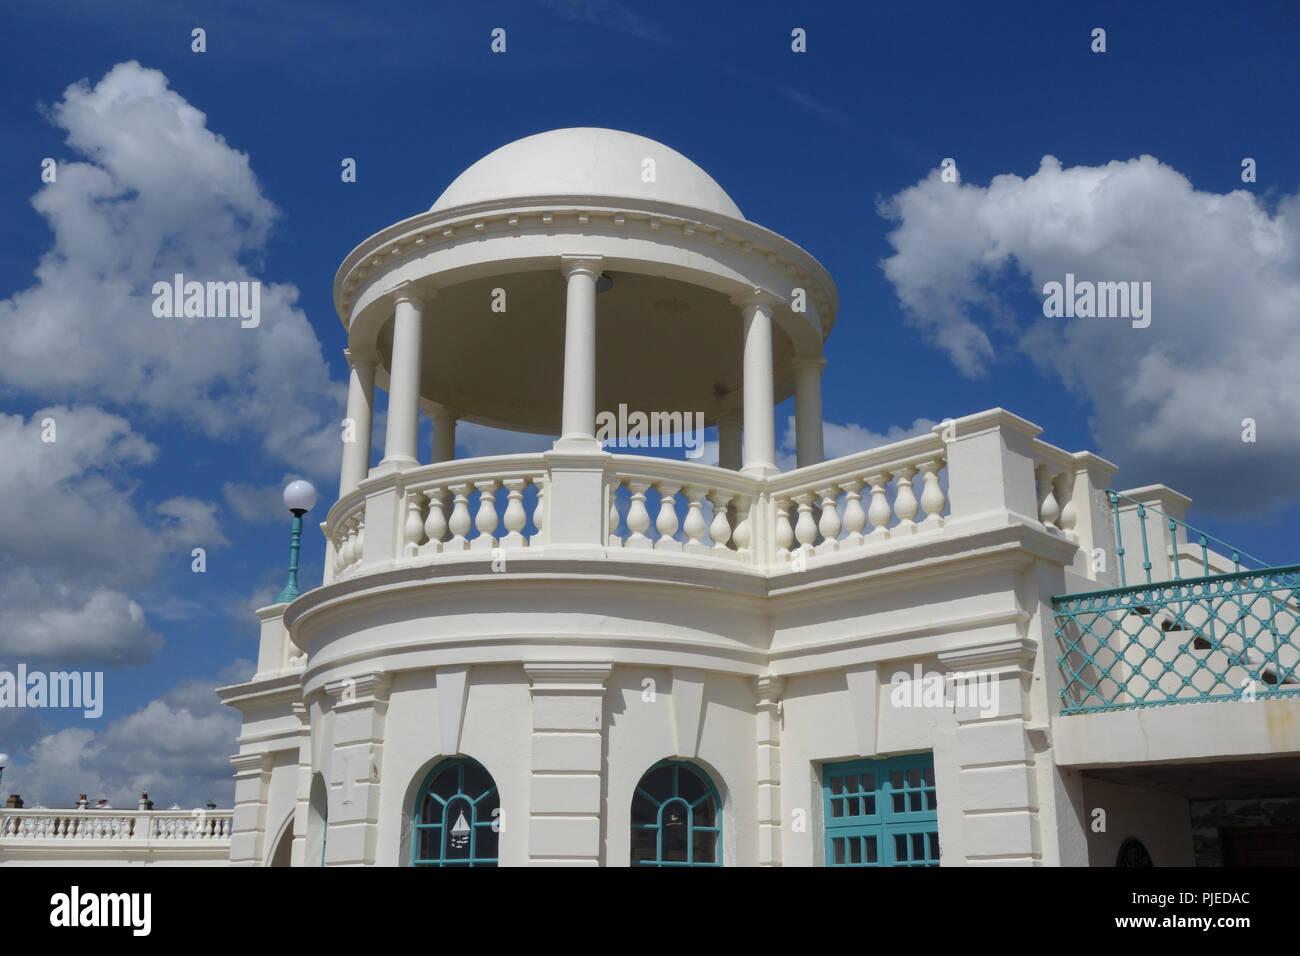 De La Warr Pavilion designed by Erich Mendelsohn and Serge Chermayeff  , Bexhill, UK - Stock Image